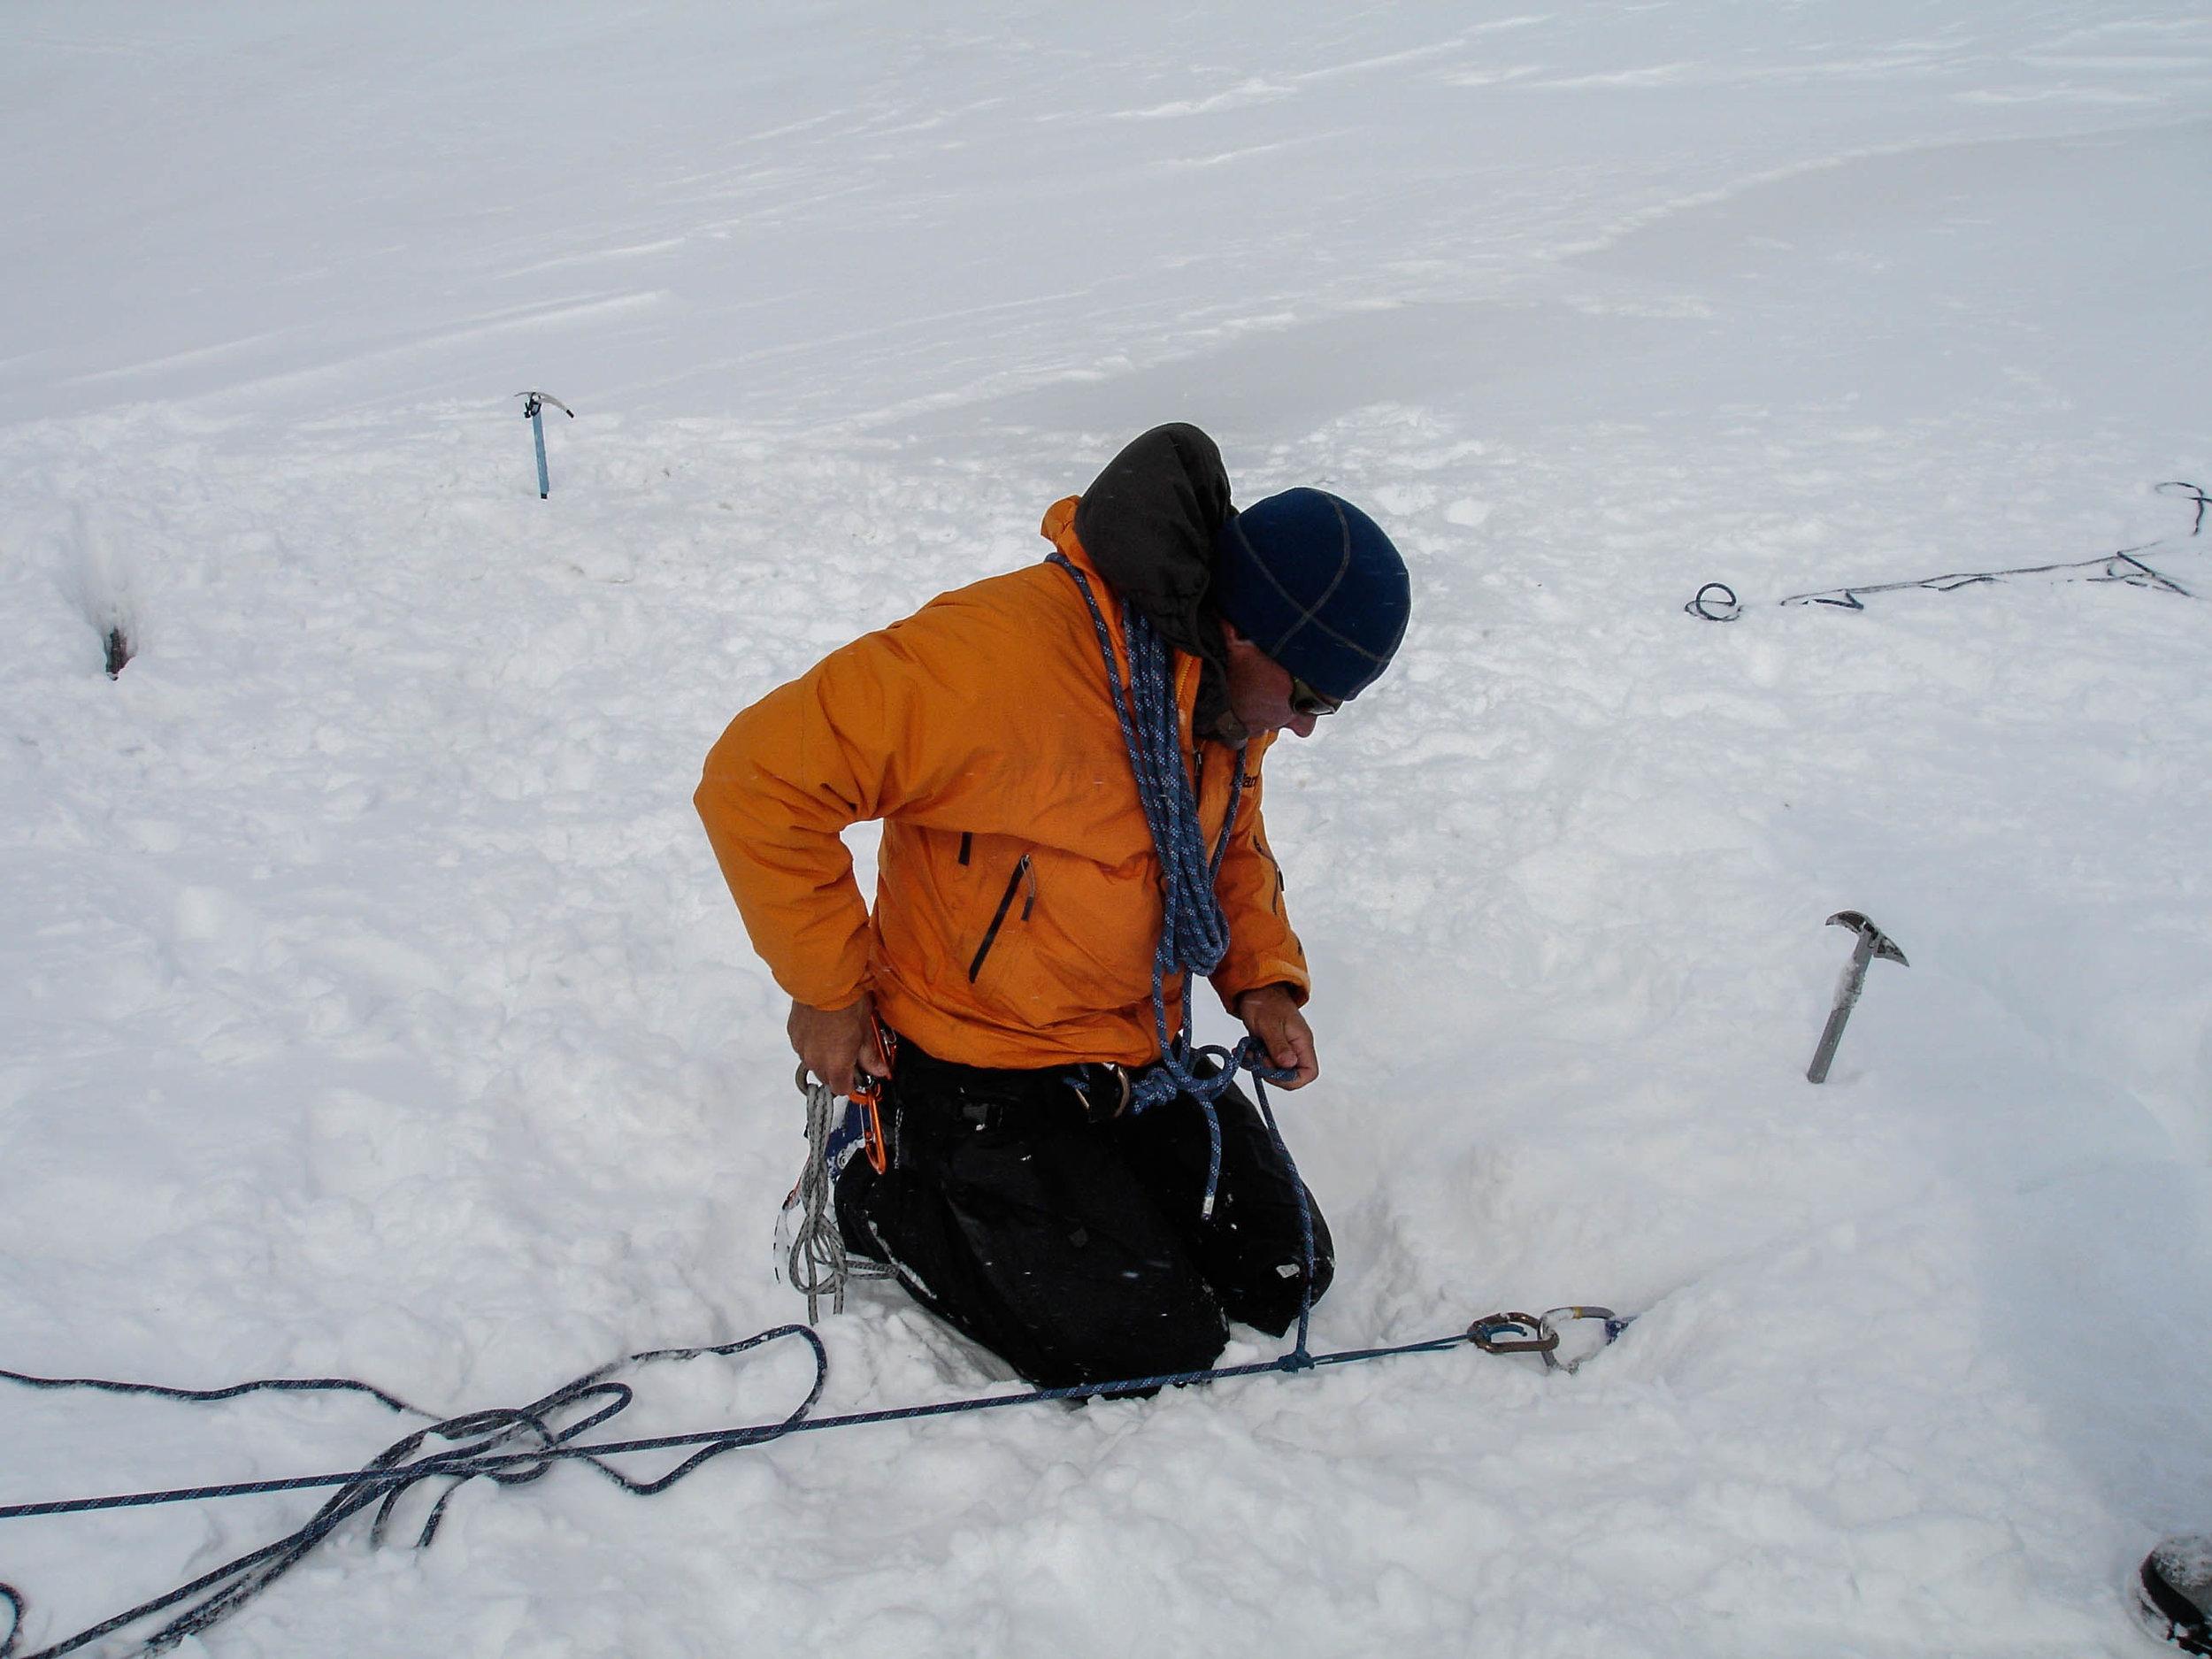 Creavsse rescue on skis practice